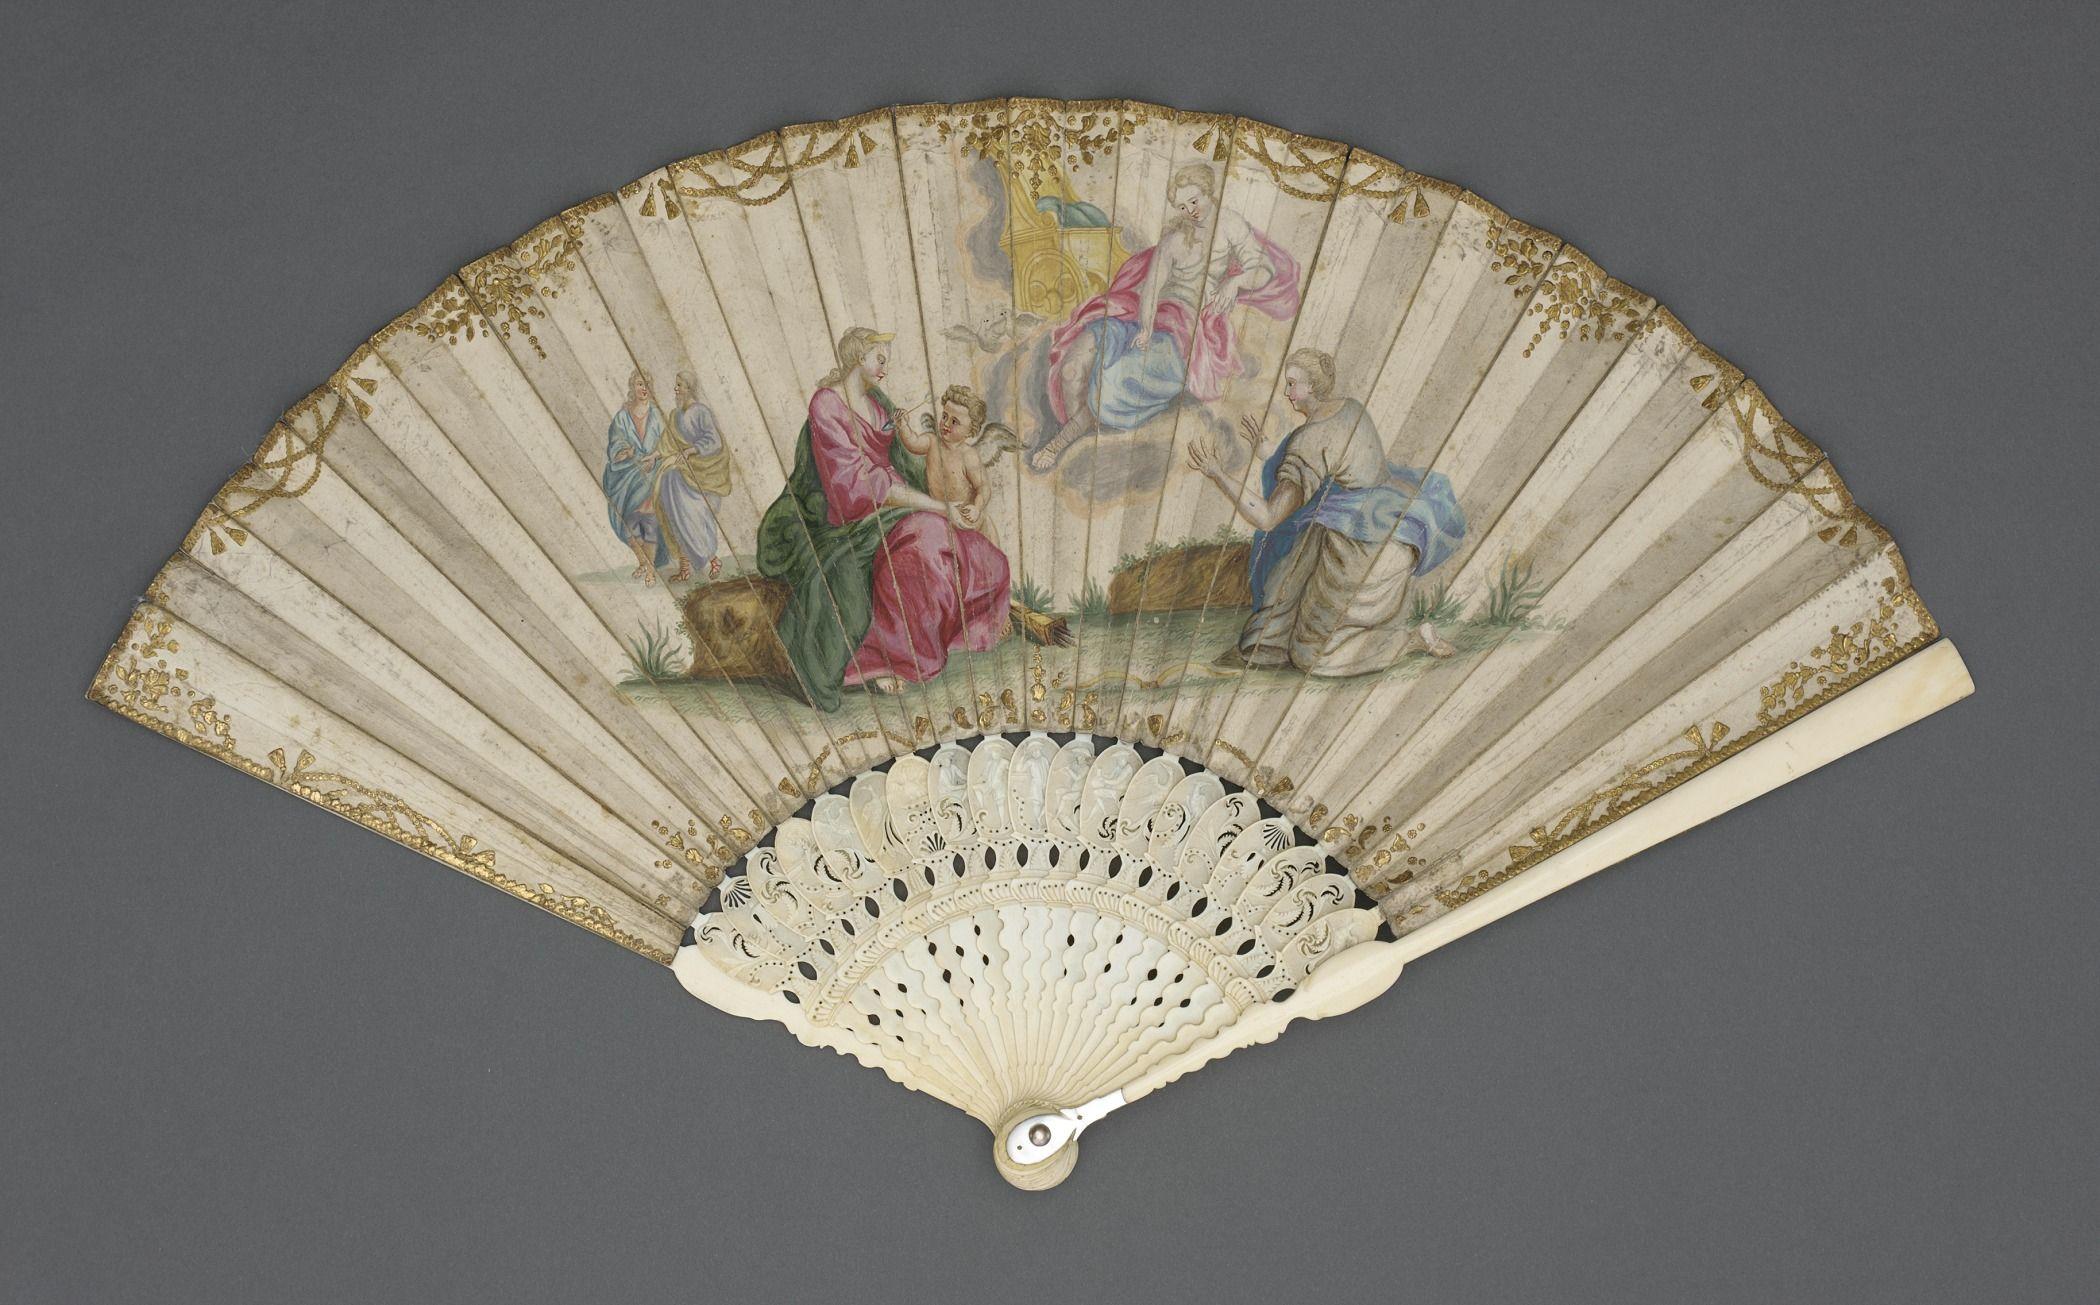 Folding Fan with Scene of Venus and Cupid | France, circa 1720. Vellum leaf, ivory sticks.